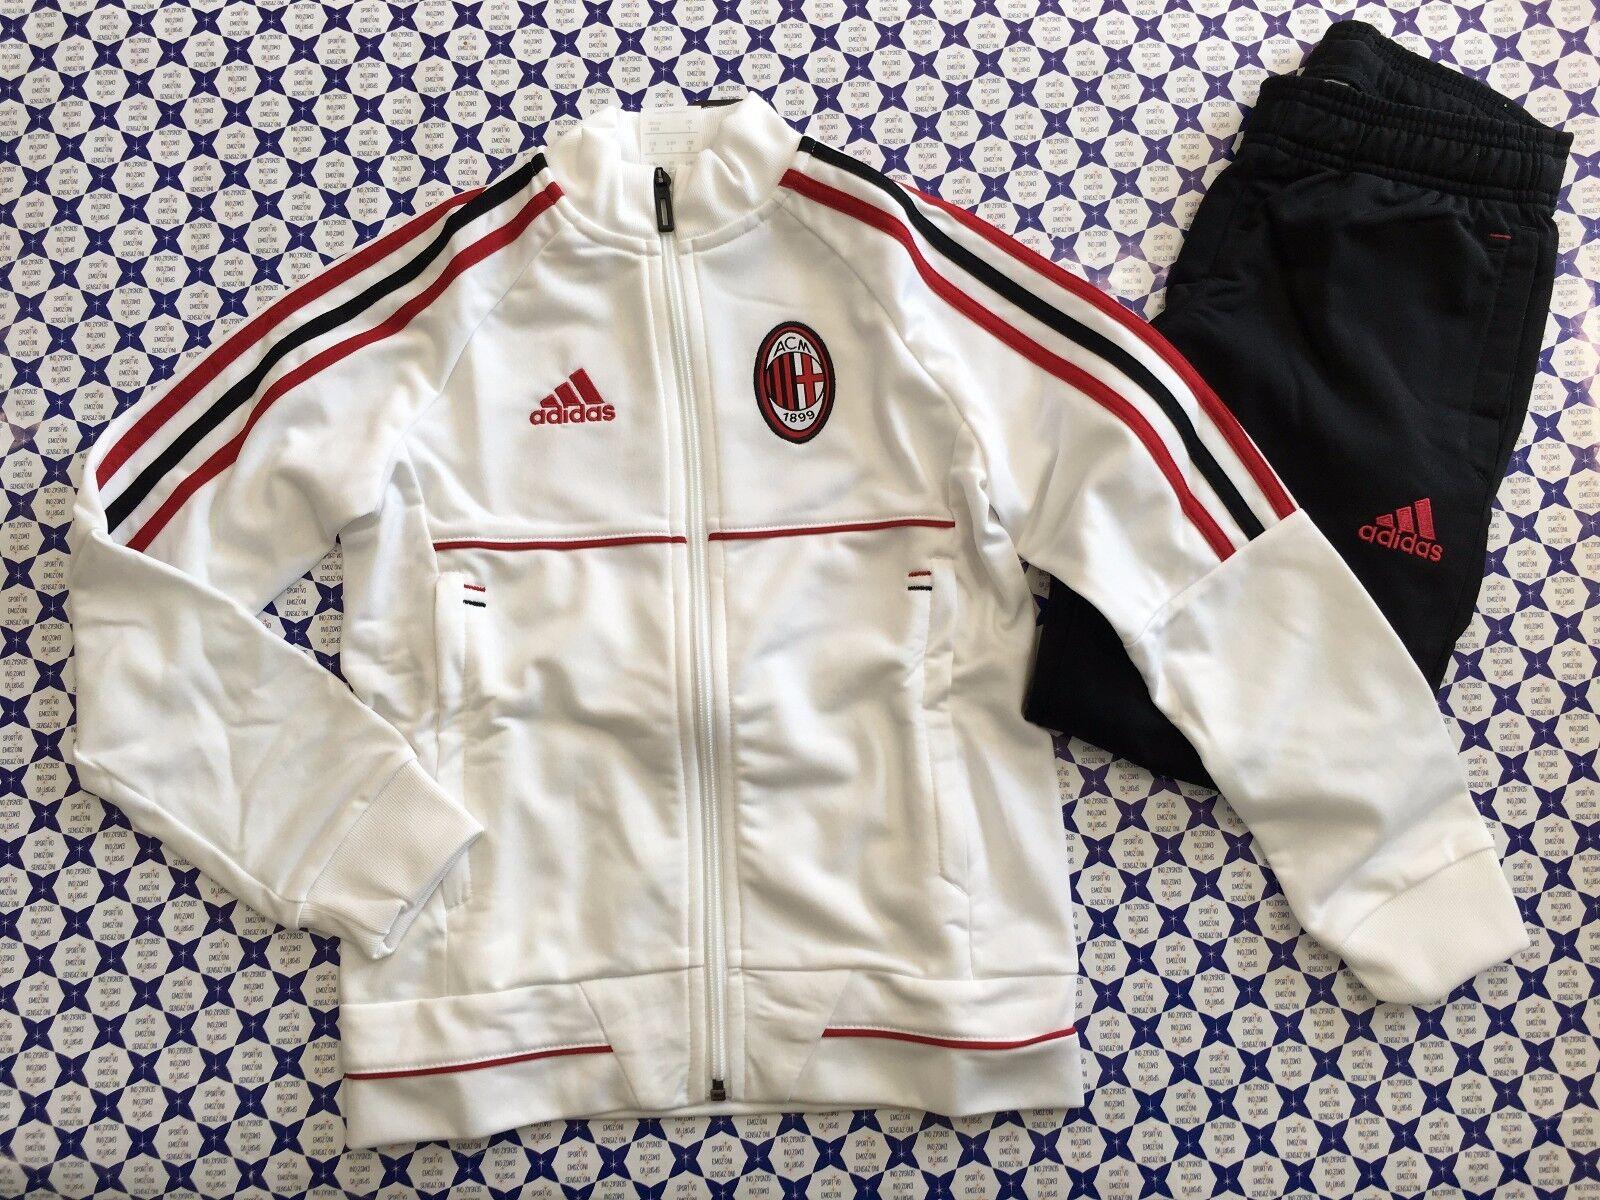 Tuta Felpa Pantaloni Acetato Adidas AC MILAN Bimbo  Bianco Nero Rosso  AZ7115